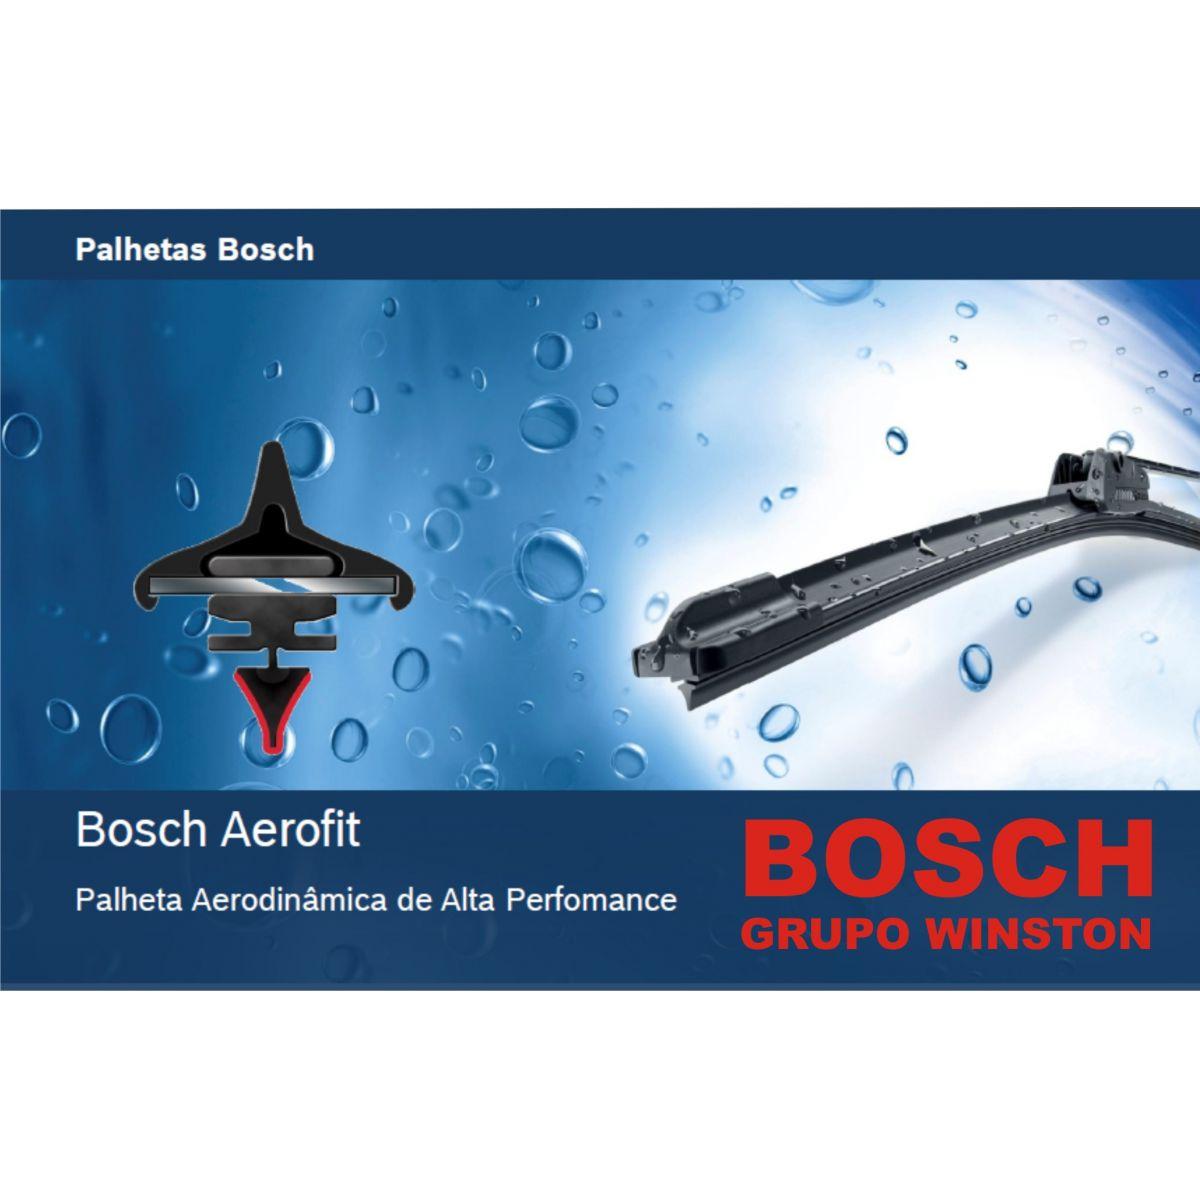 Palheta Bosch Aerofit Limpador de para brisa Bosch FERRARI F355 / Berlineta / Spider